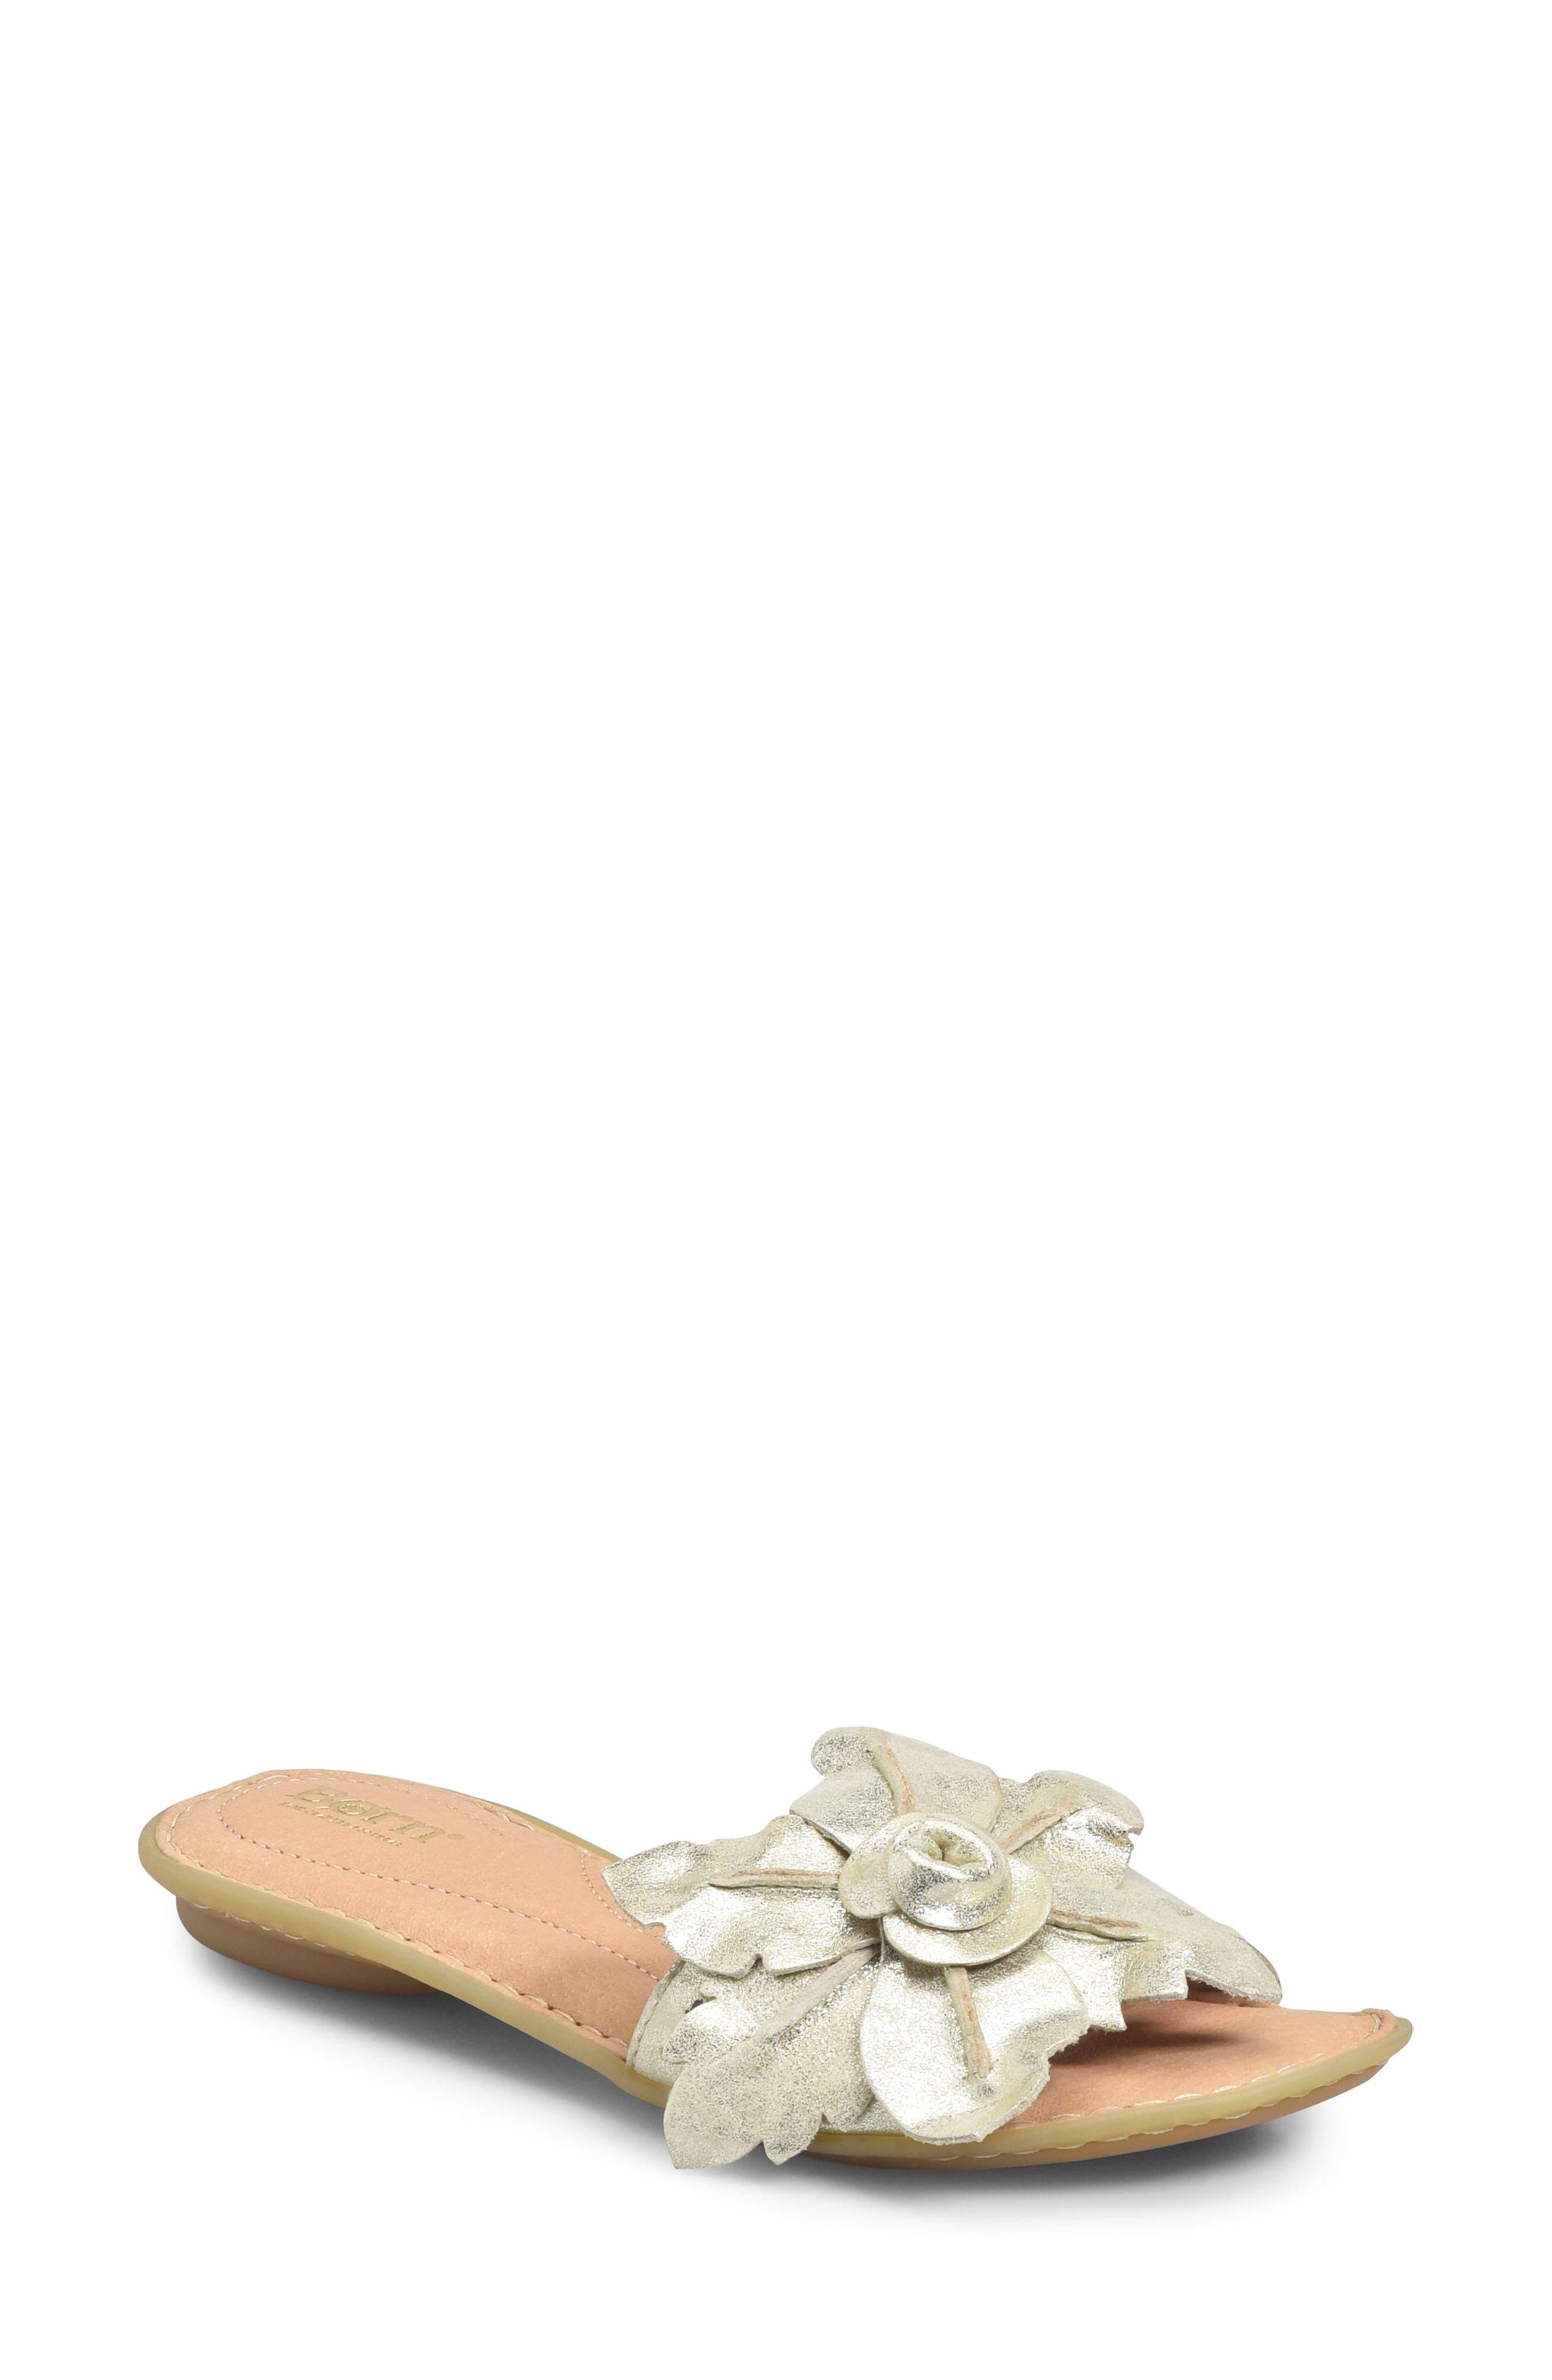 B?rn Mai Floral Sandal, Metallic